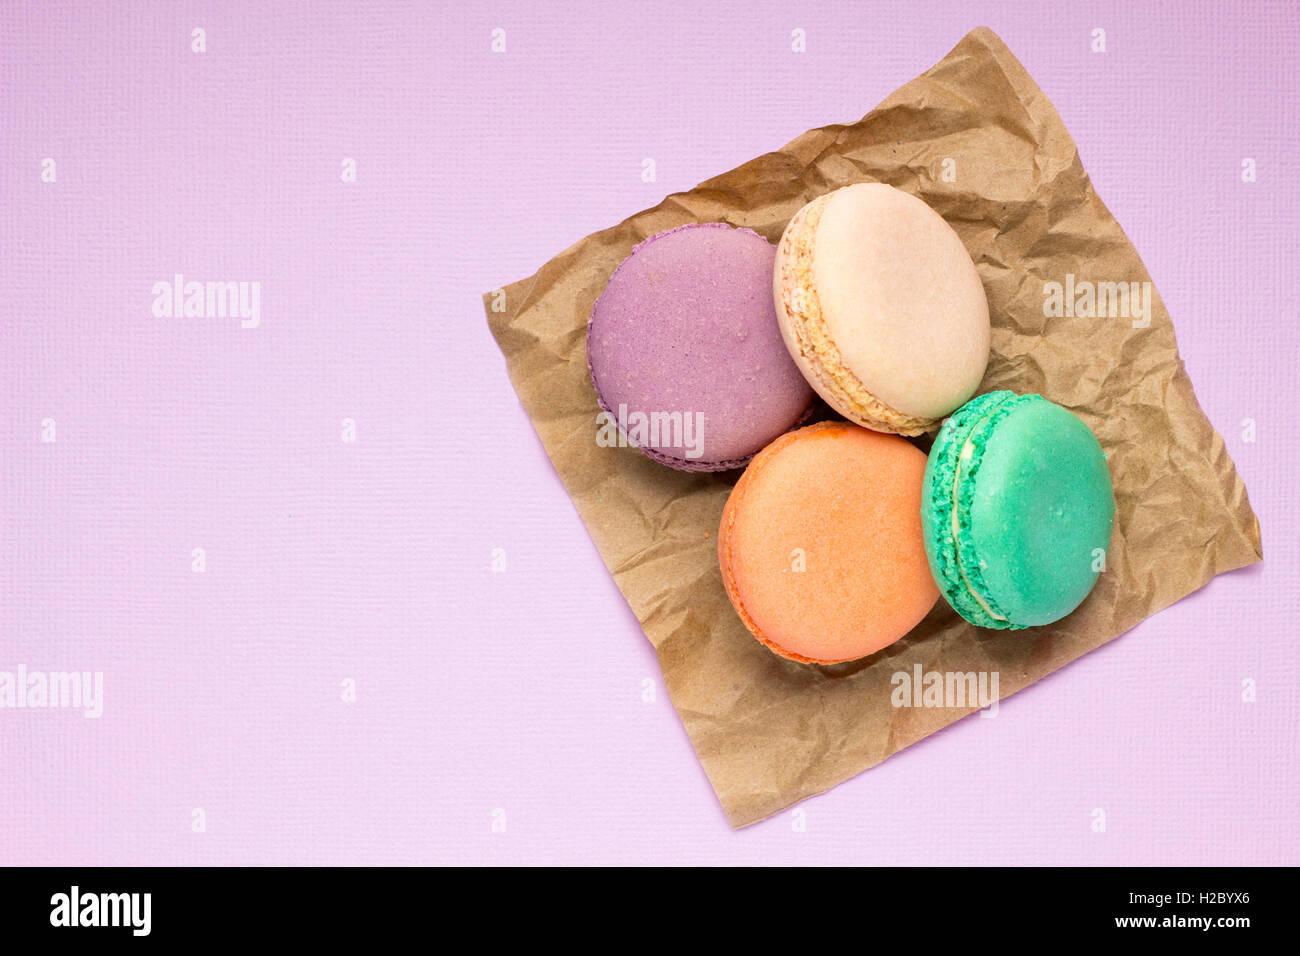 Creative photo of macaroons on purple background. - Stock Image